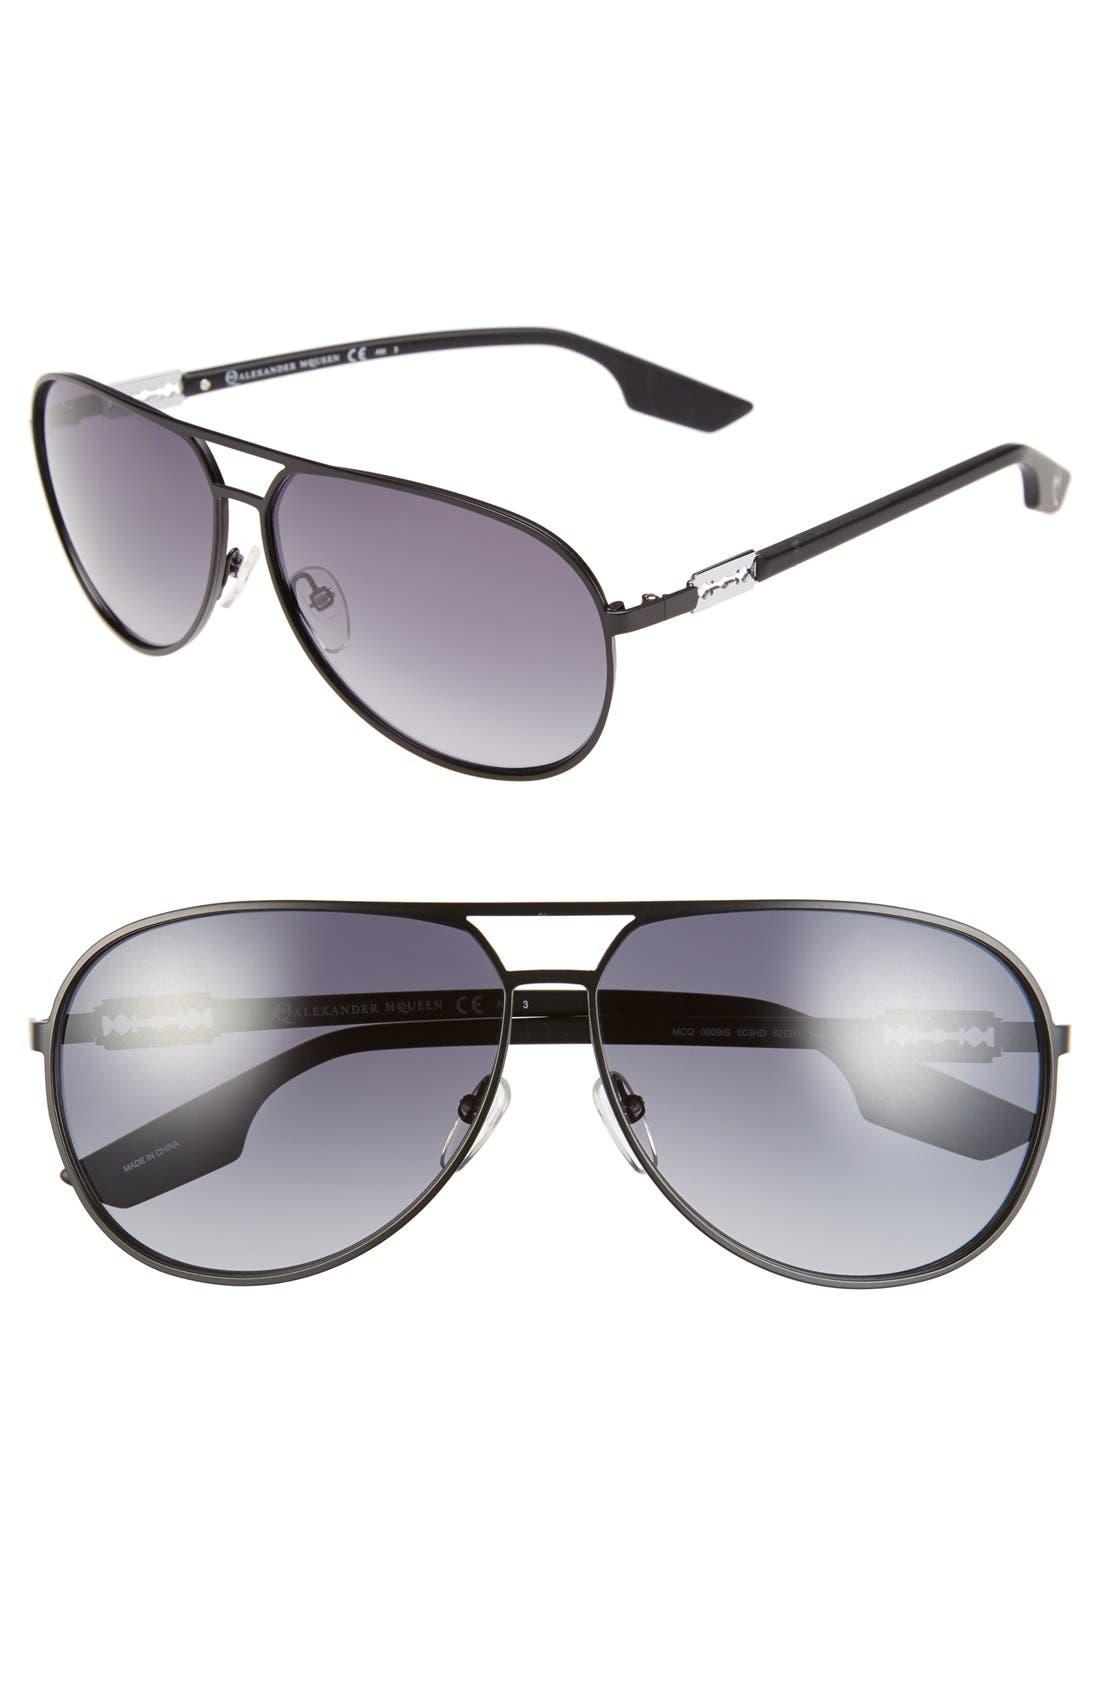 MCQ ALEXANDER MCQUEEN McQ by Alexander McQueen 62mm Stainless Steel Aviator Sunglasses, Main, color, 001